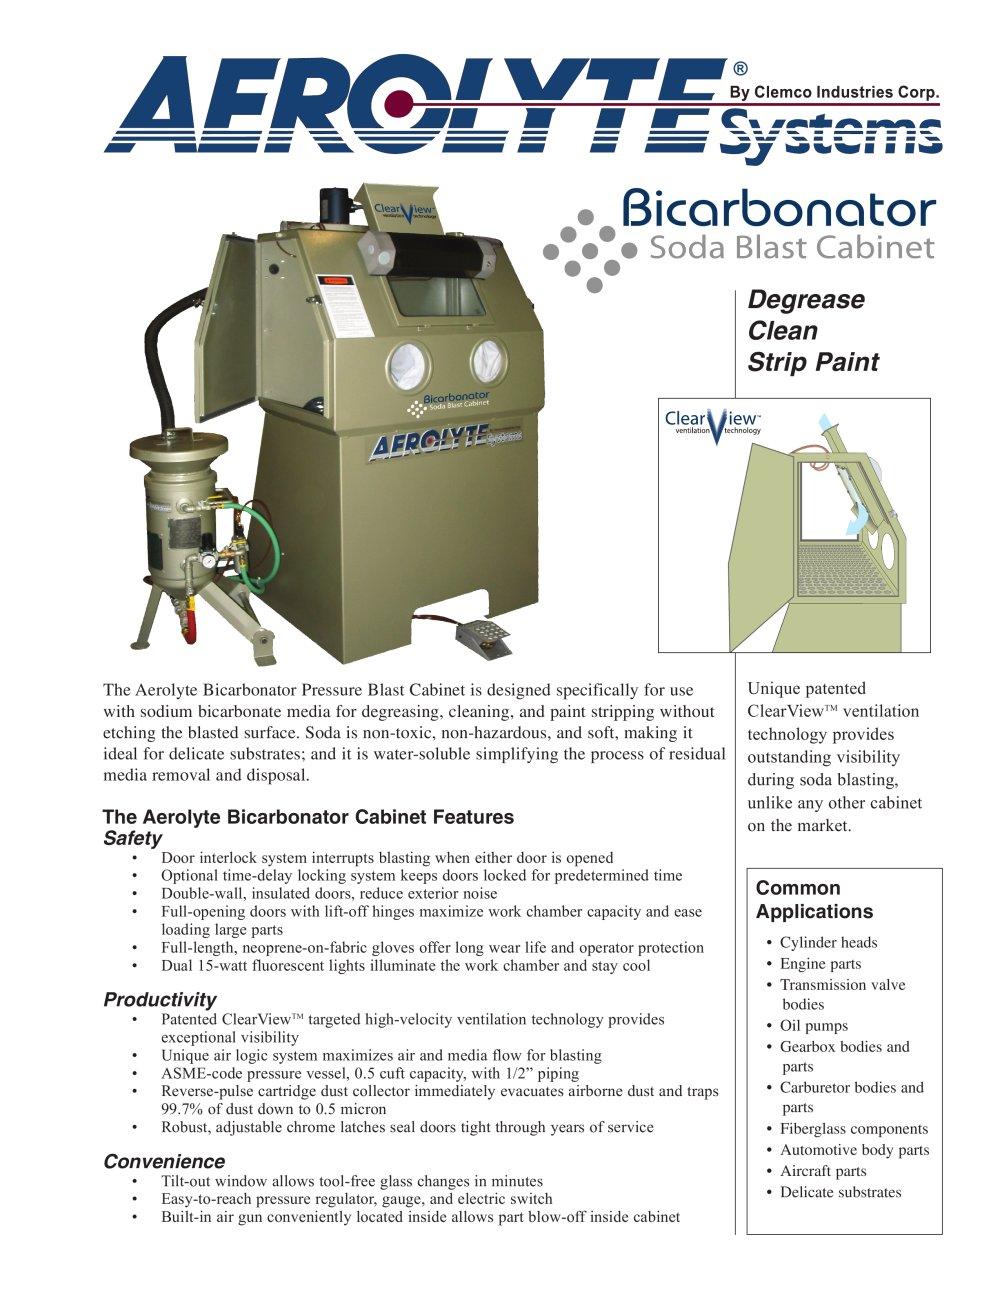 Clemco Industries Blast Cabinets The Bicarbonator Pressure Blast Cabinet Rev D Clemco